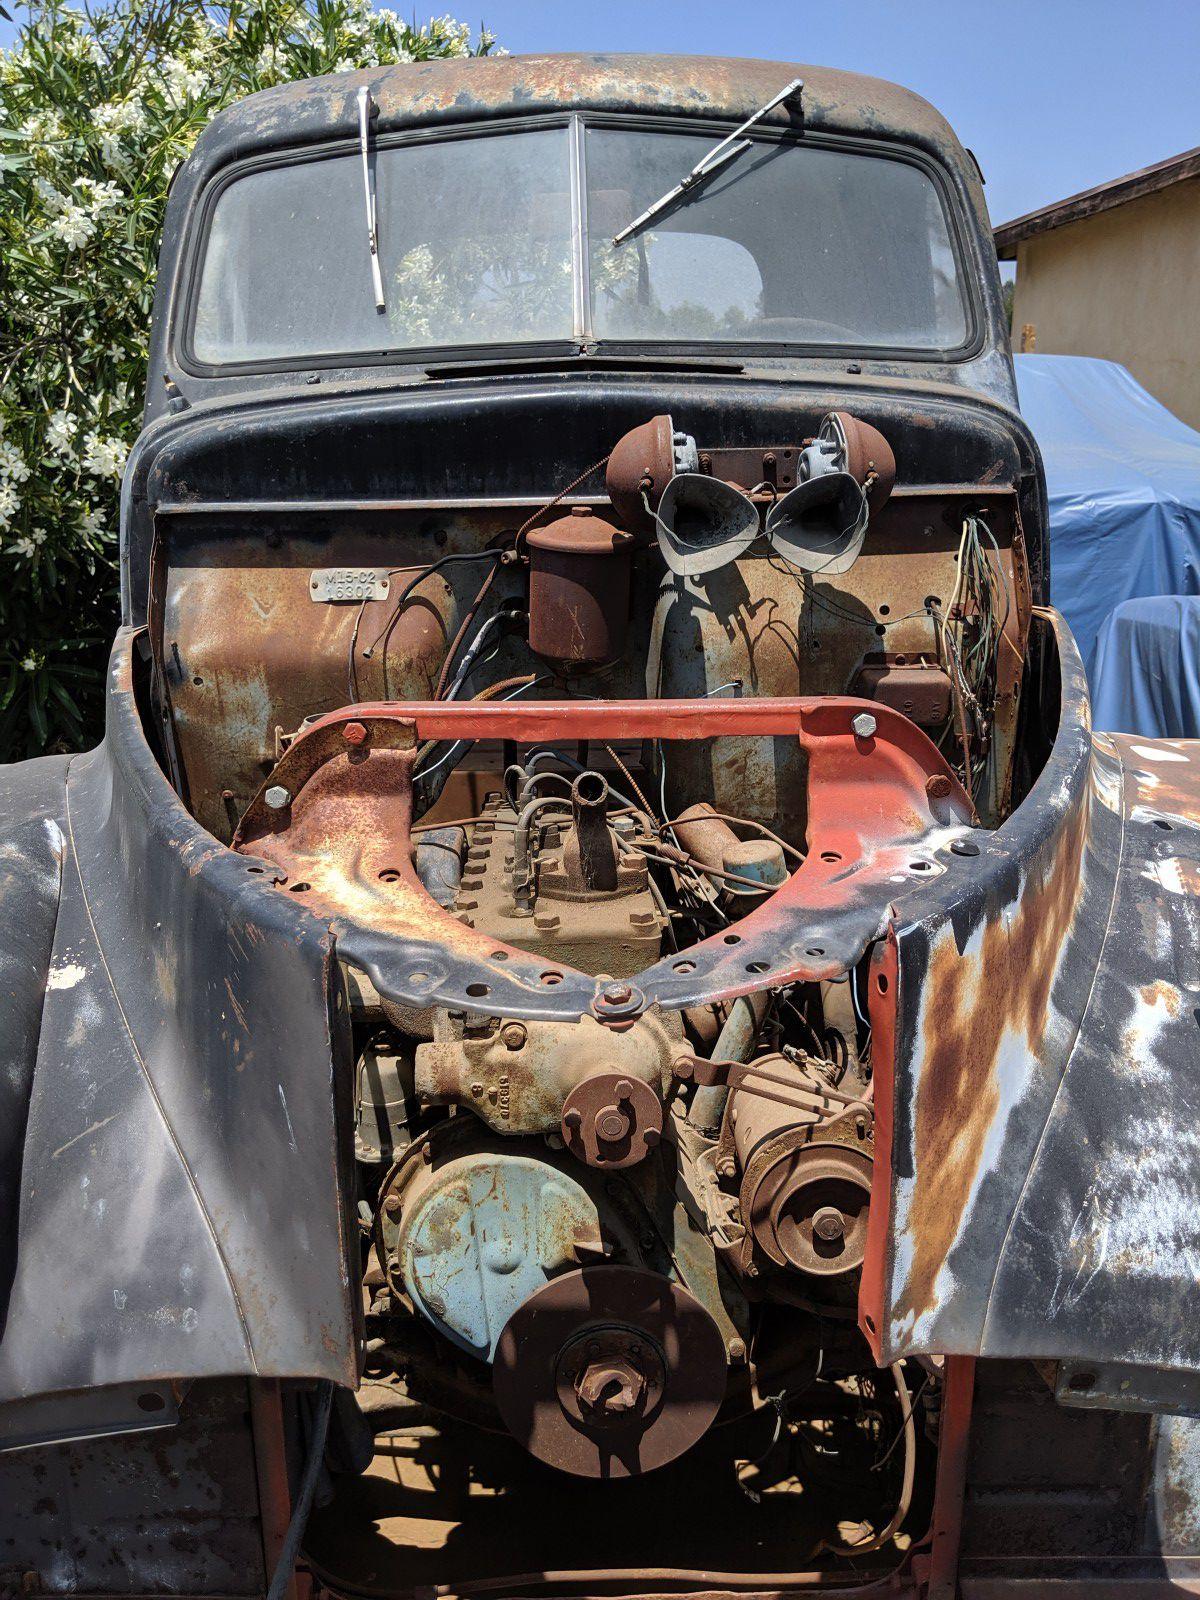 46-48 Studebaker M15 dually truck 1 Ton